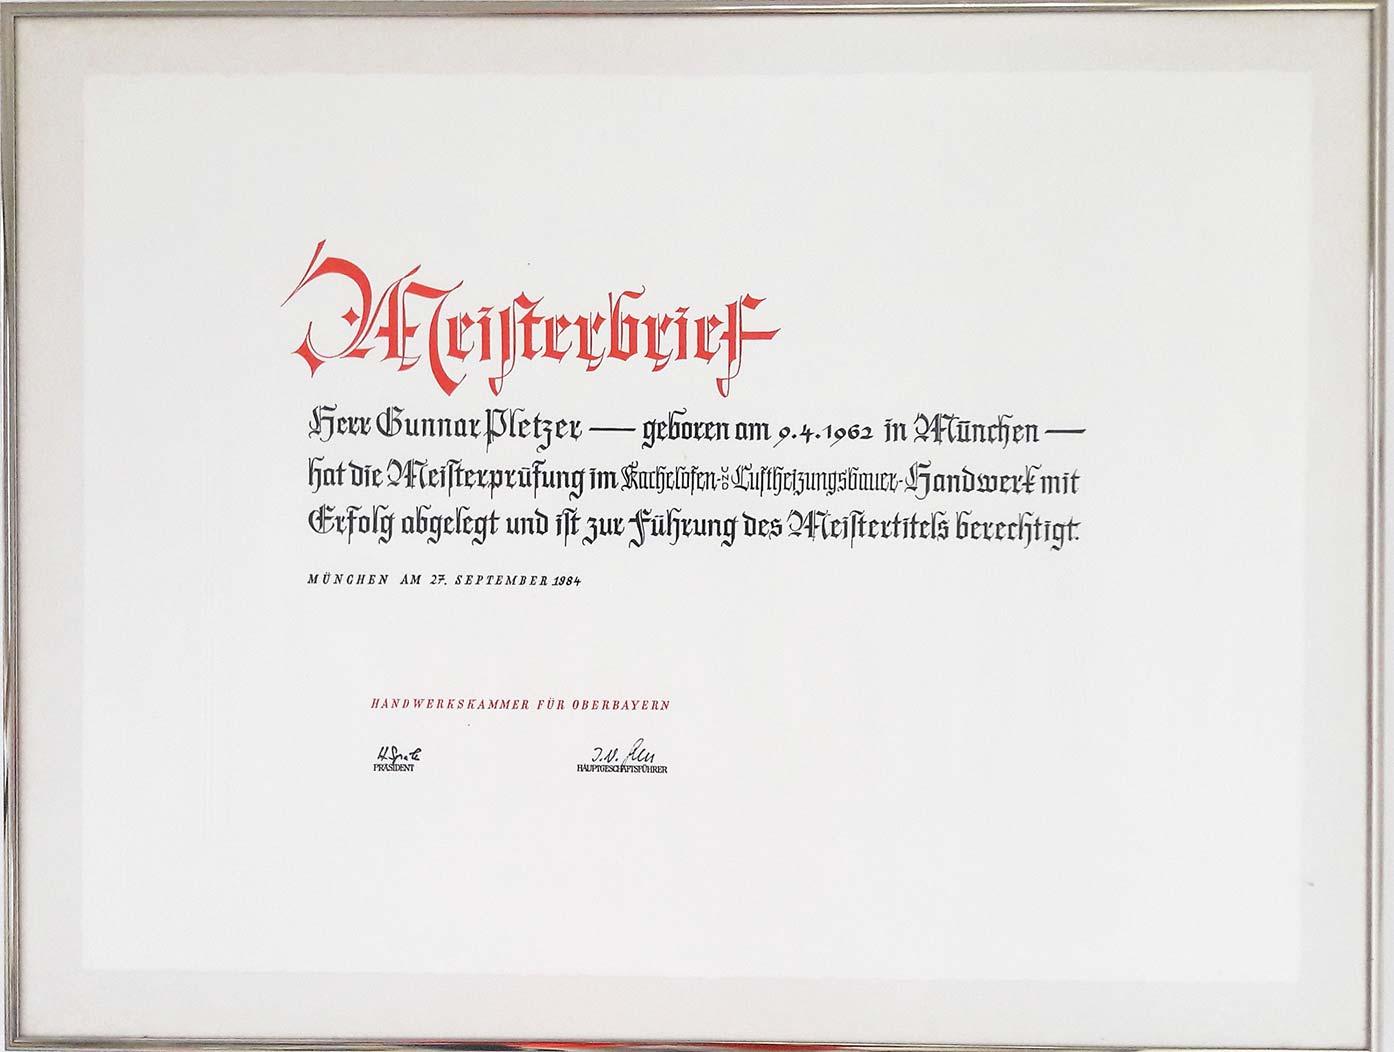 Ofenbau Pletzer Meisterbrief